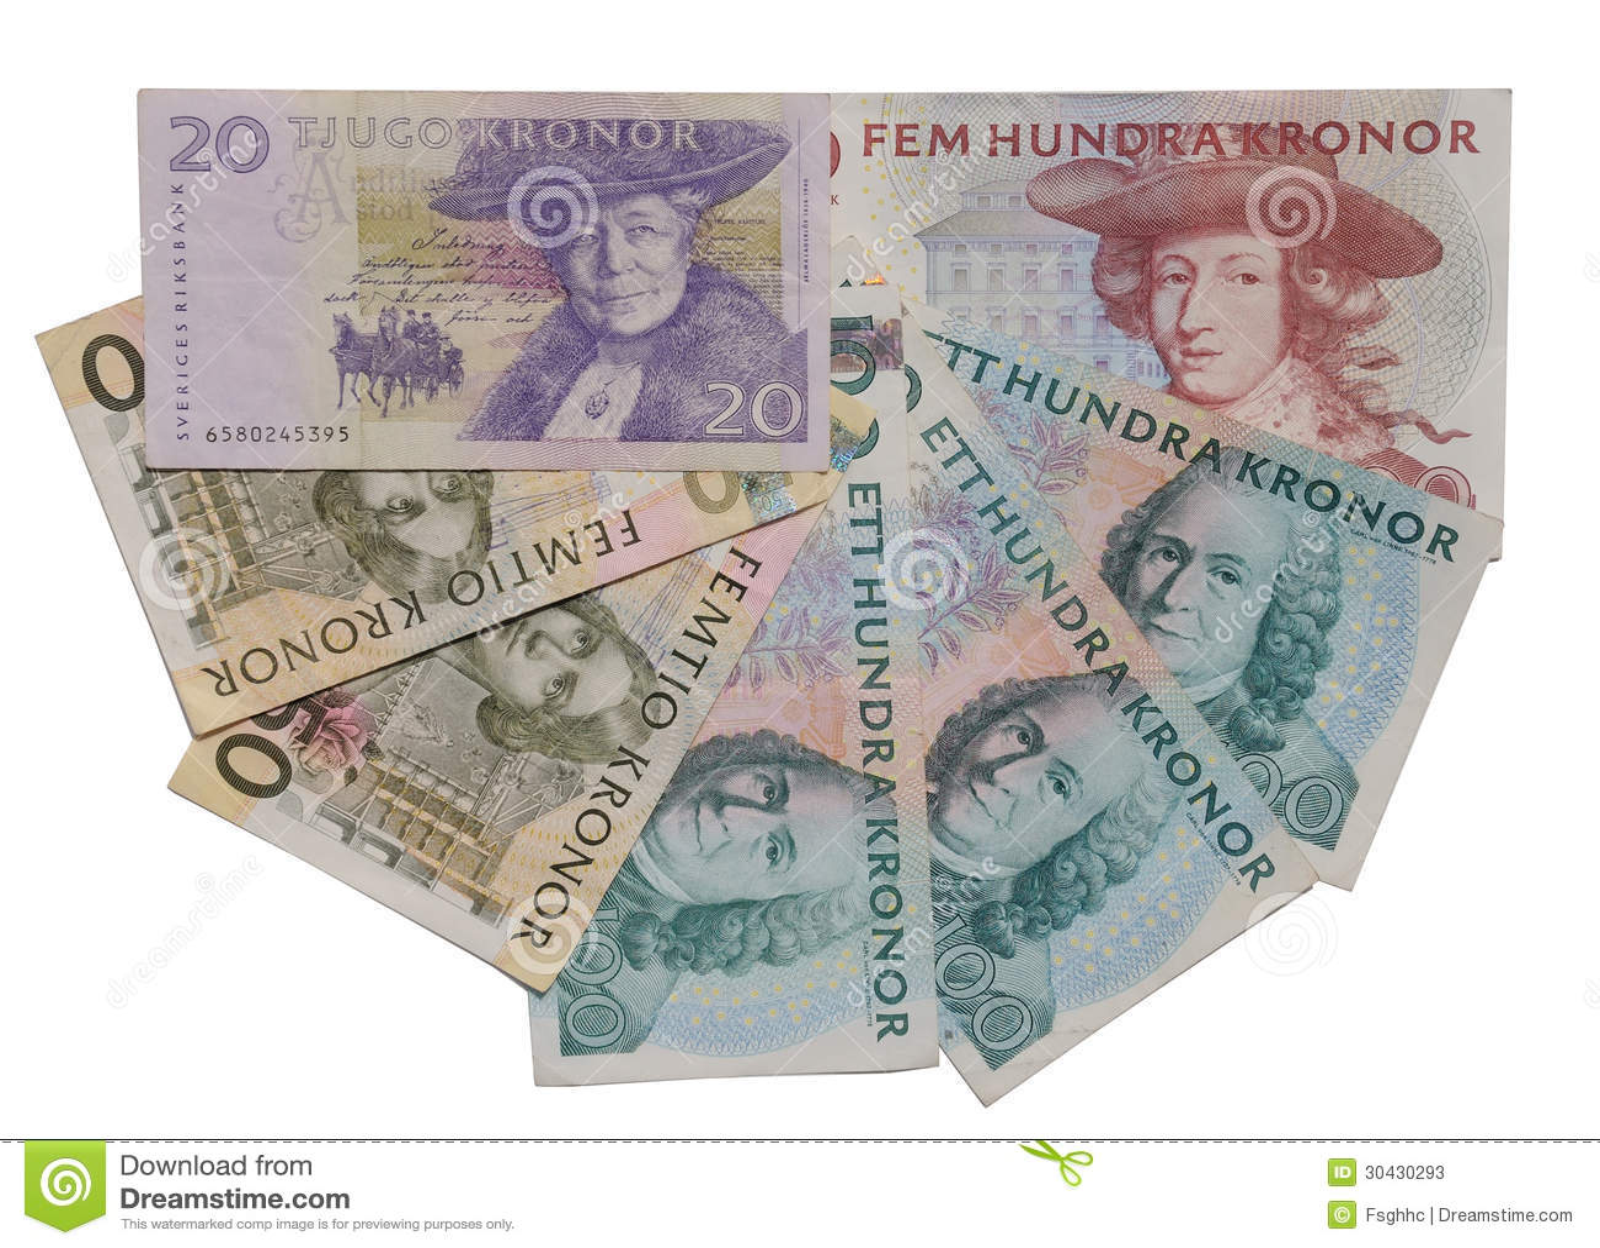 billet de banque suedois